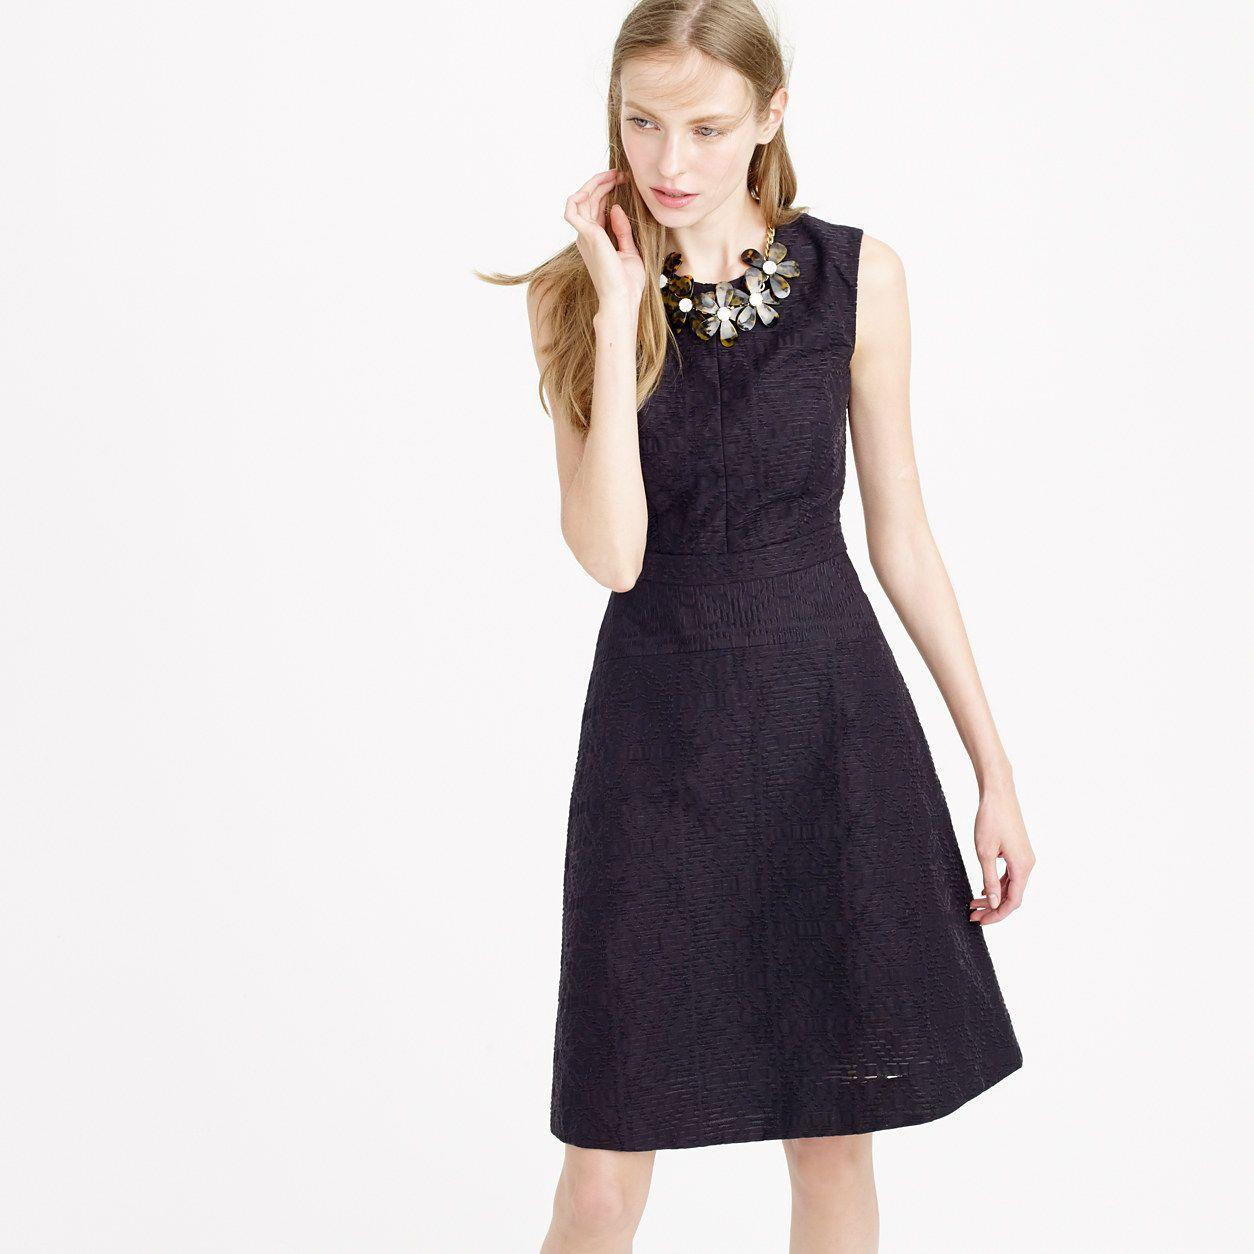 Textured eyelet jacquard dress dresses jcrew soir pinterest